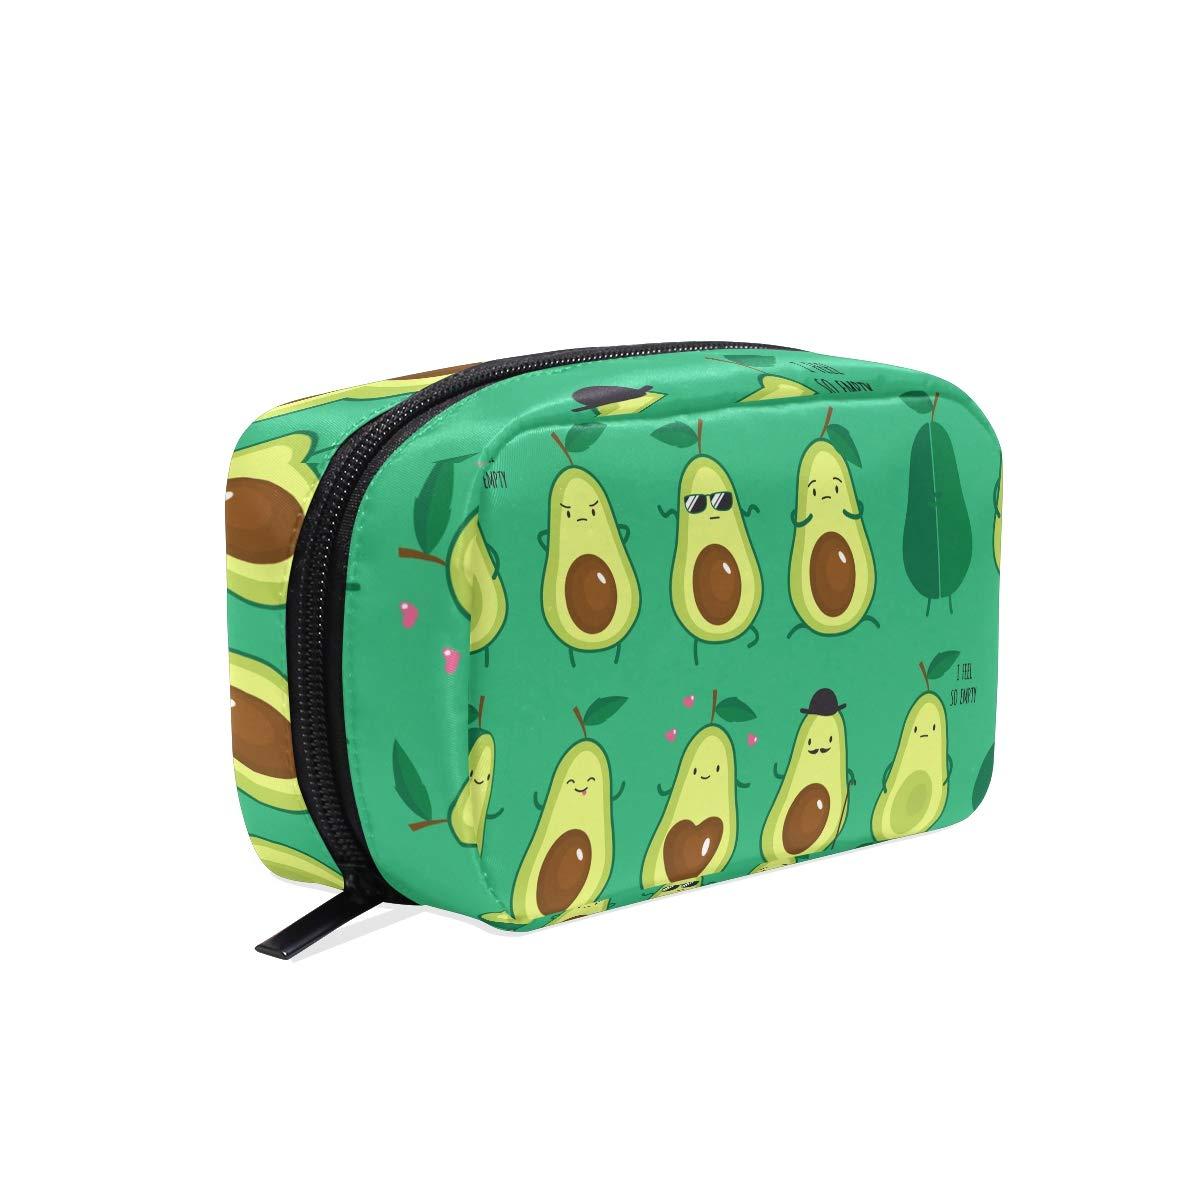 Amazon.com: Bolsa de aseo Avocado para cosméticos, bolsa de ...